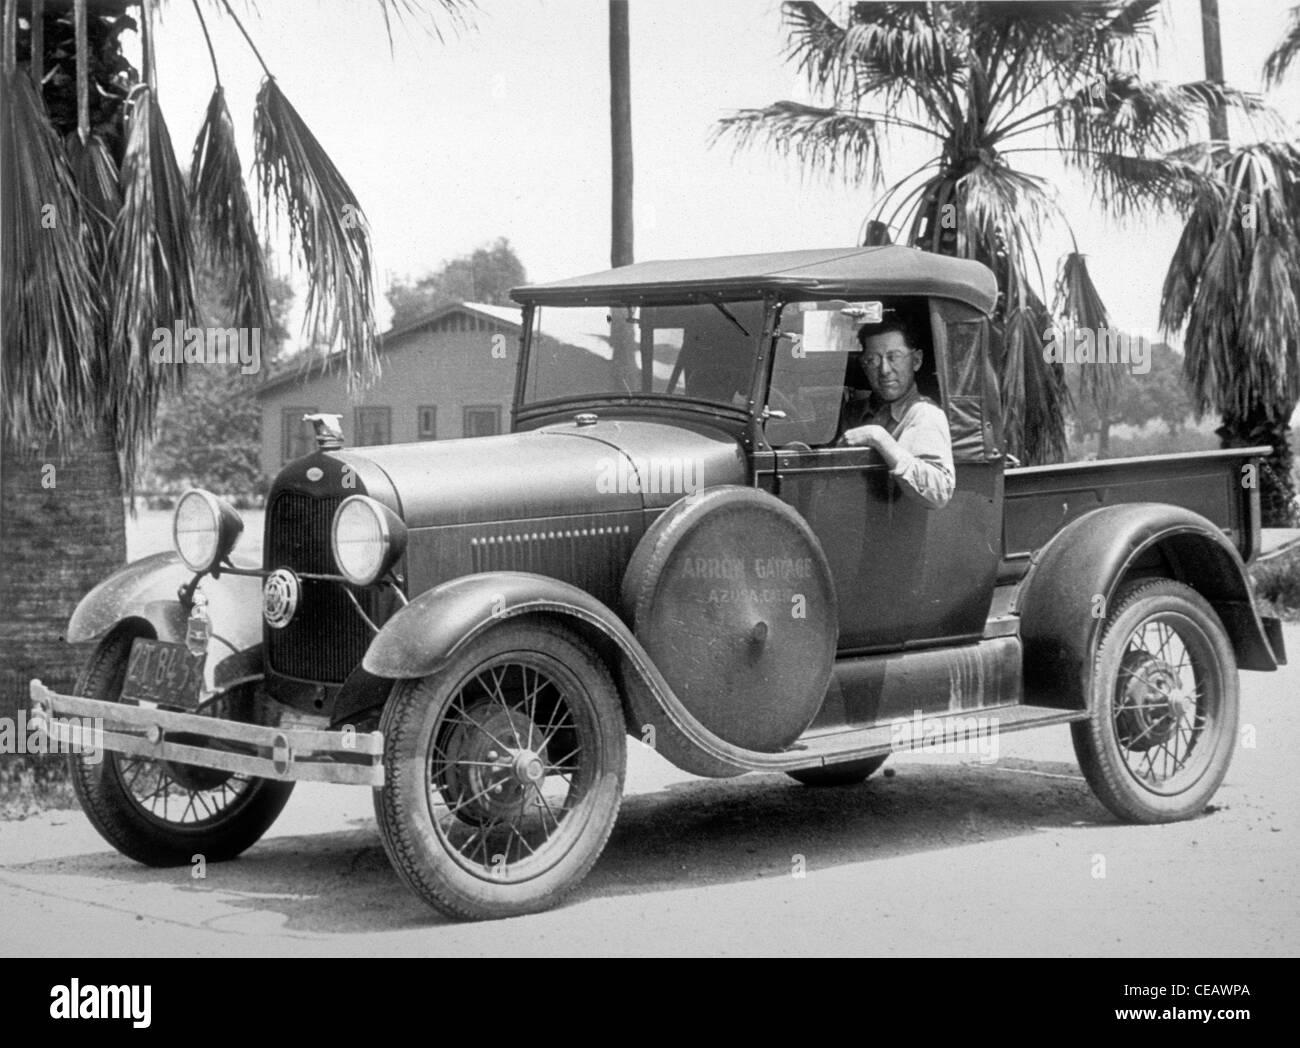 azuza garage repair truck ford 1920s southern california. Black Bedroom Furniture Sets. Home Design Ideas